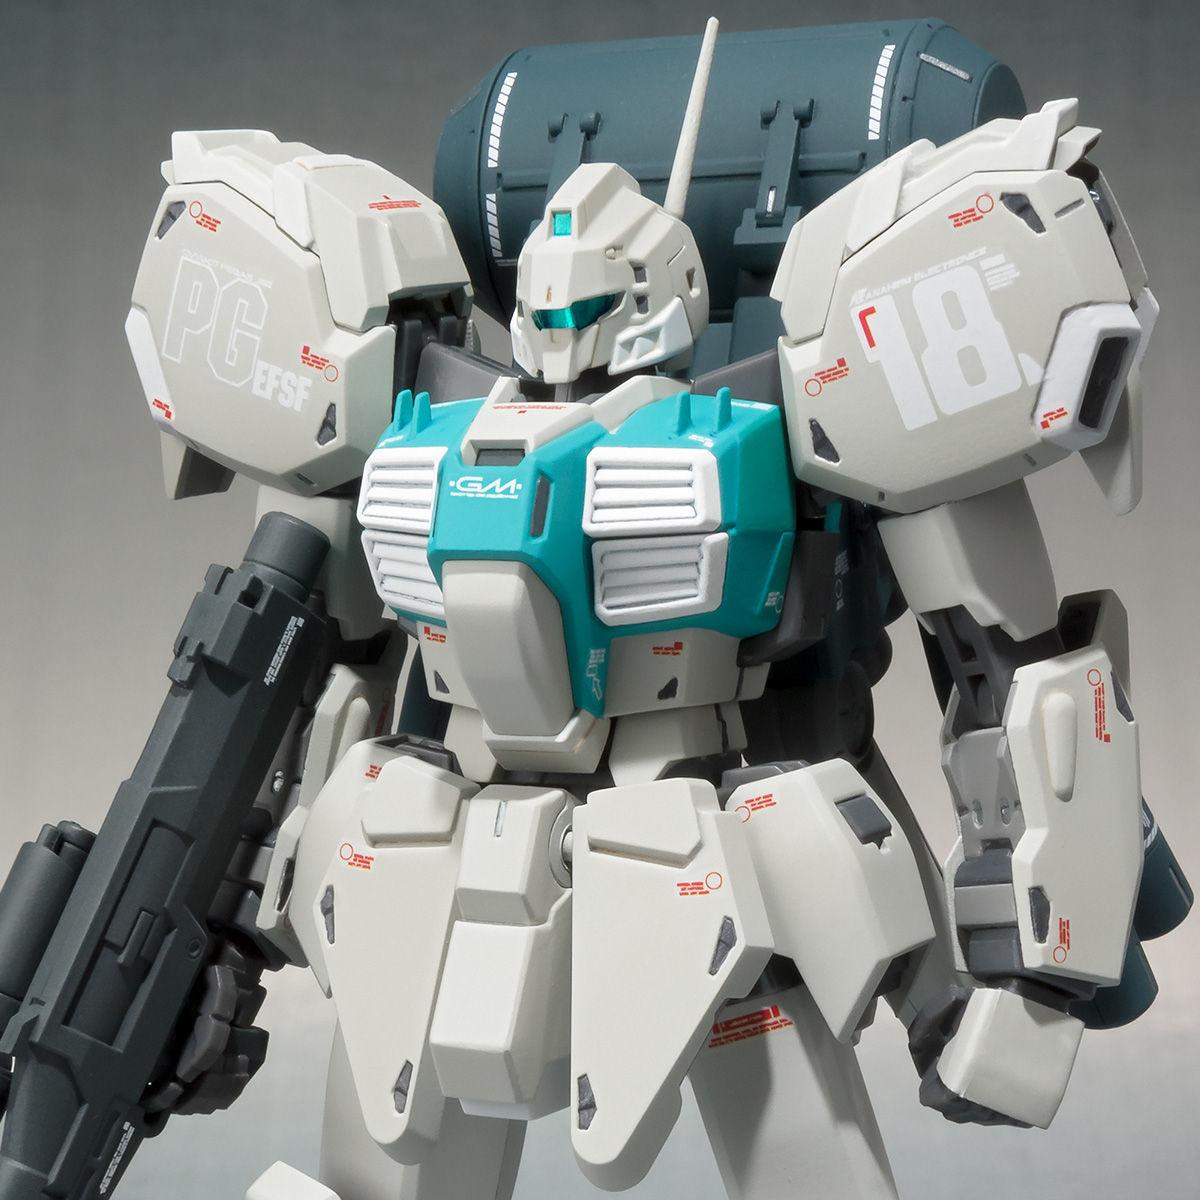 ROBOT魂(Ka signature)〈SIDE MS〉『ネロ(月面降下仕様)マーキングプラスVer.』ガンダム・センチネル 可動フィギュア-001